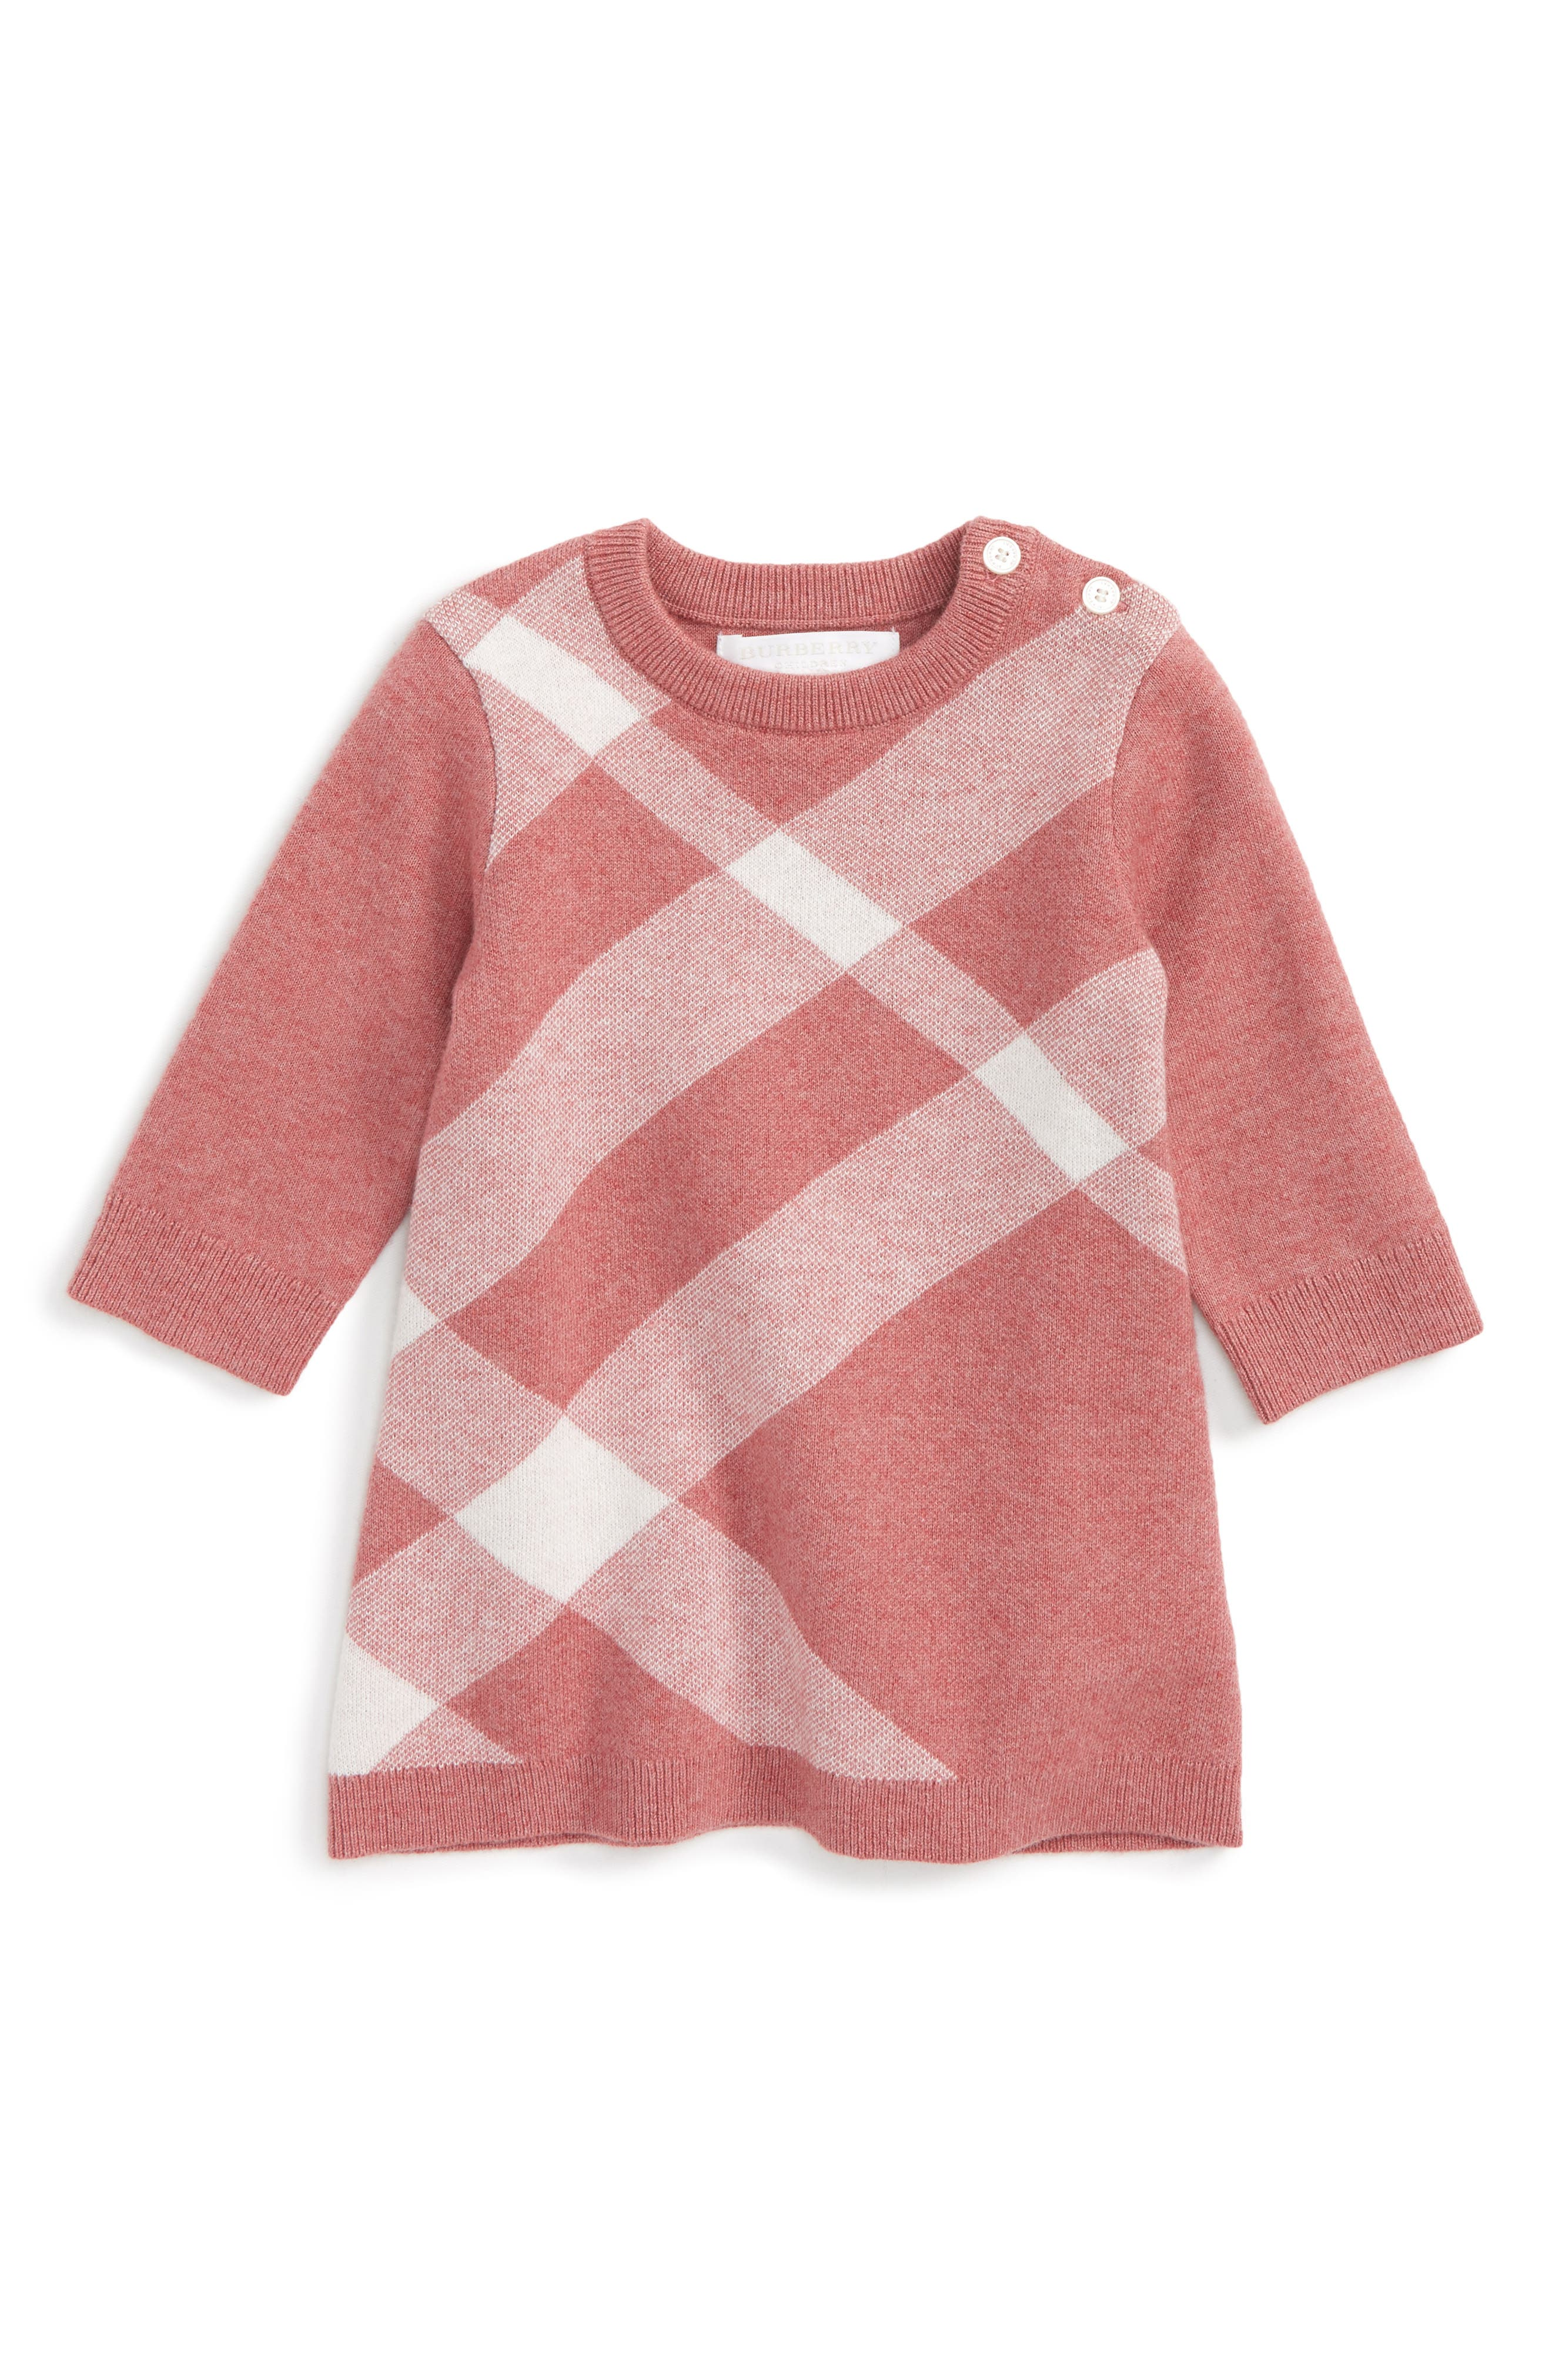 Burberry Check Dress (Baby Girls)